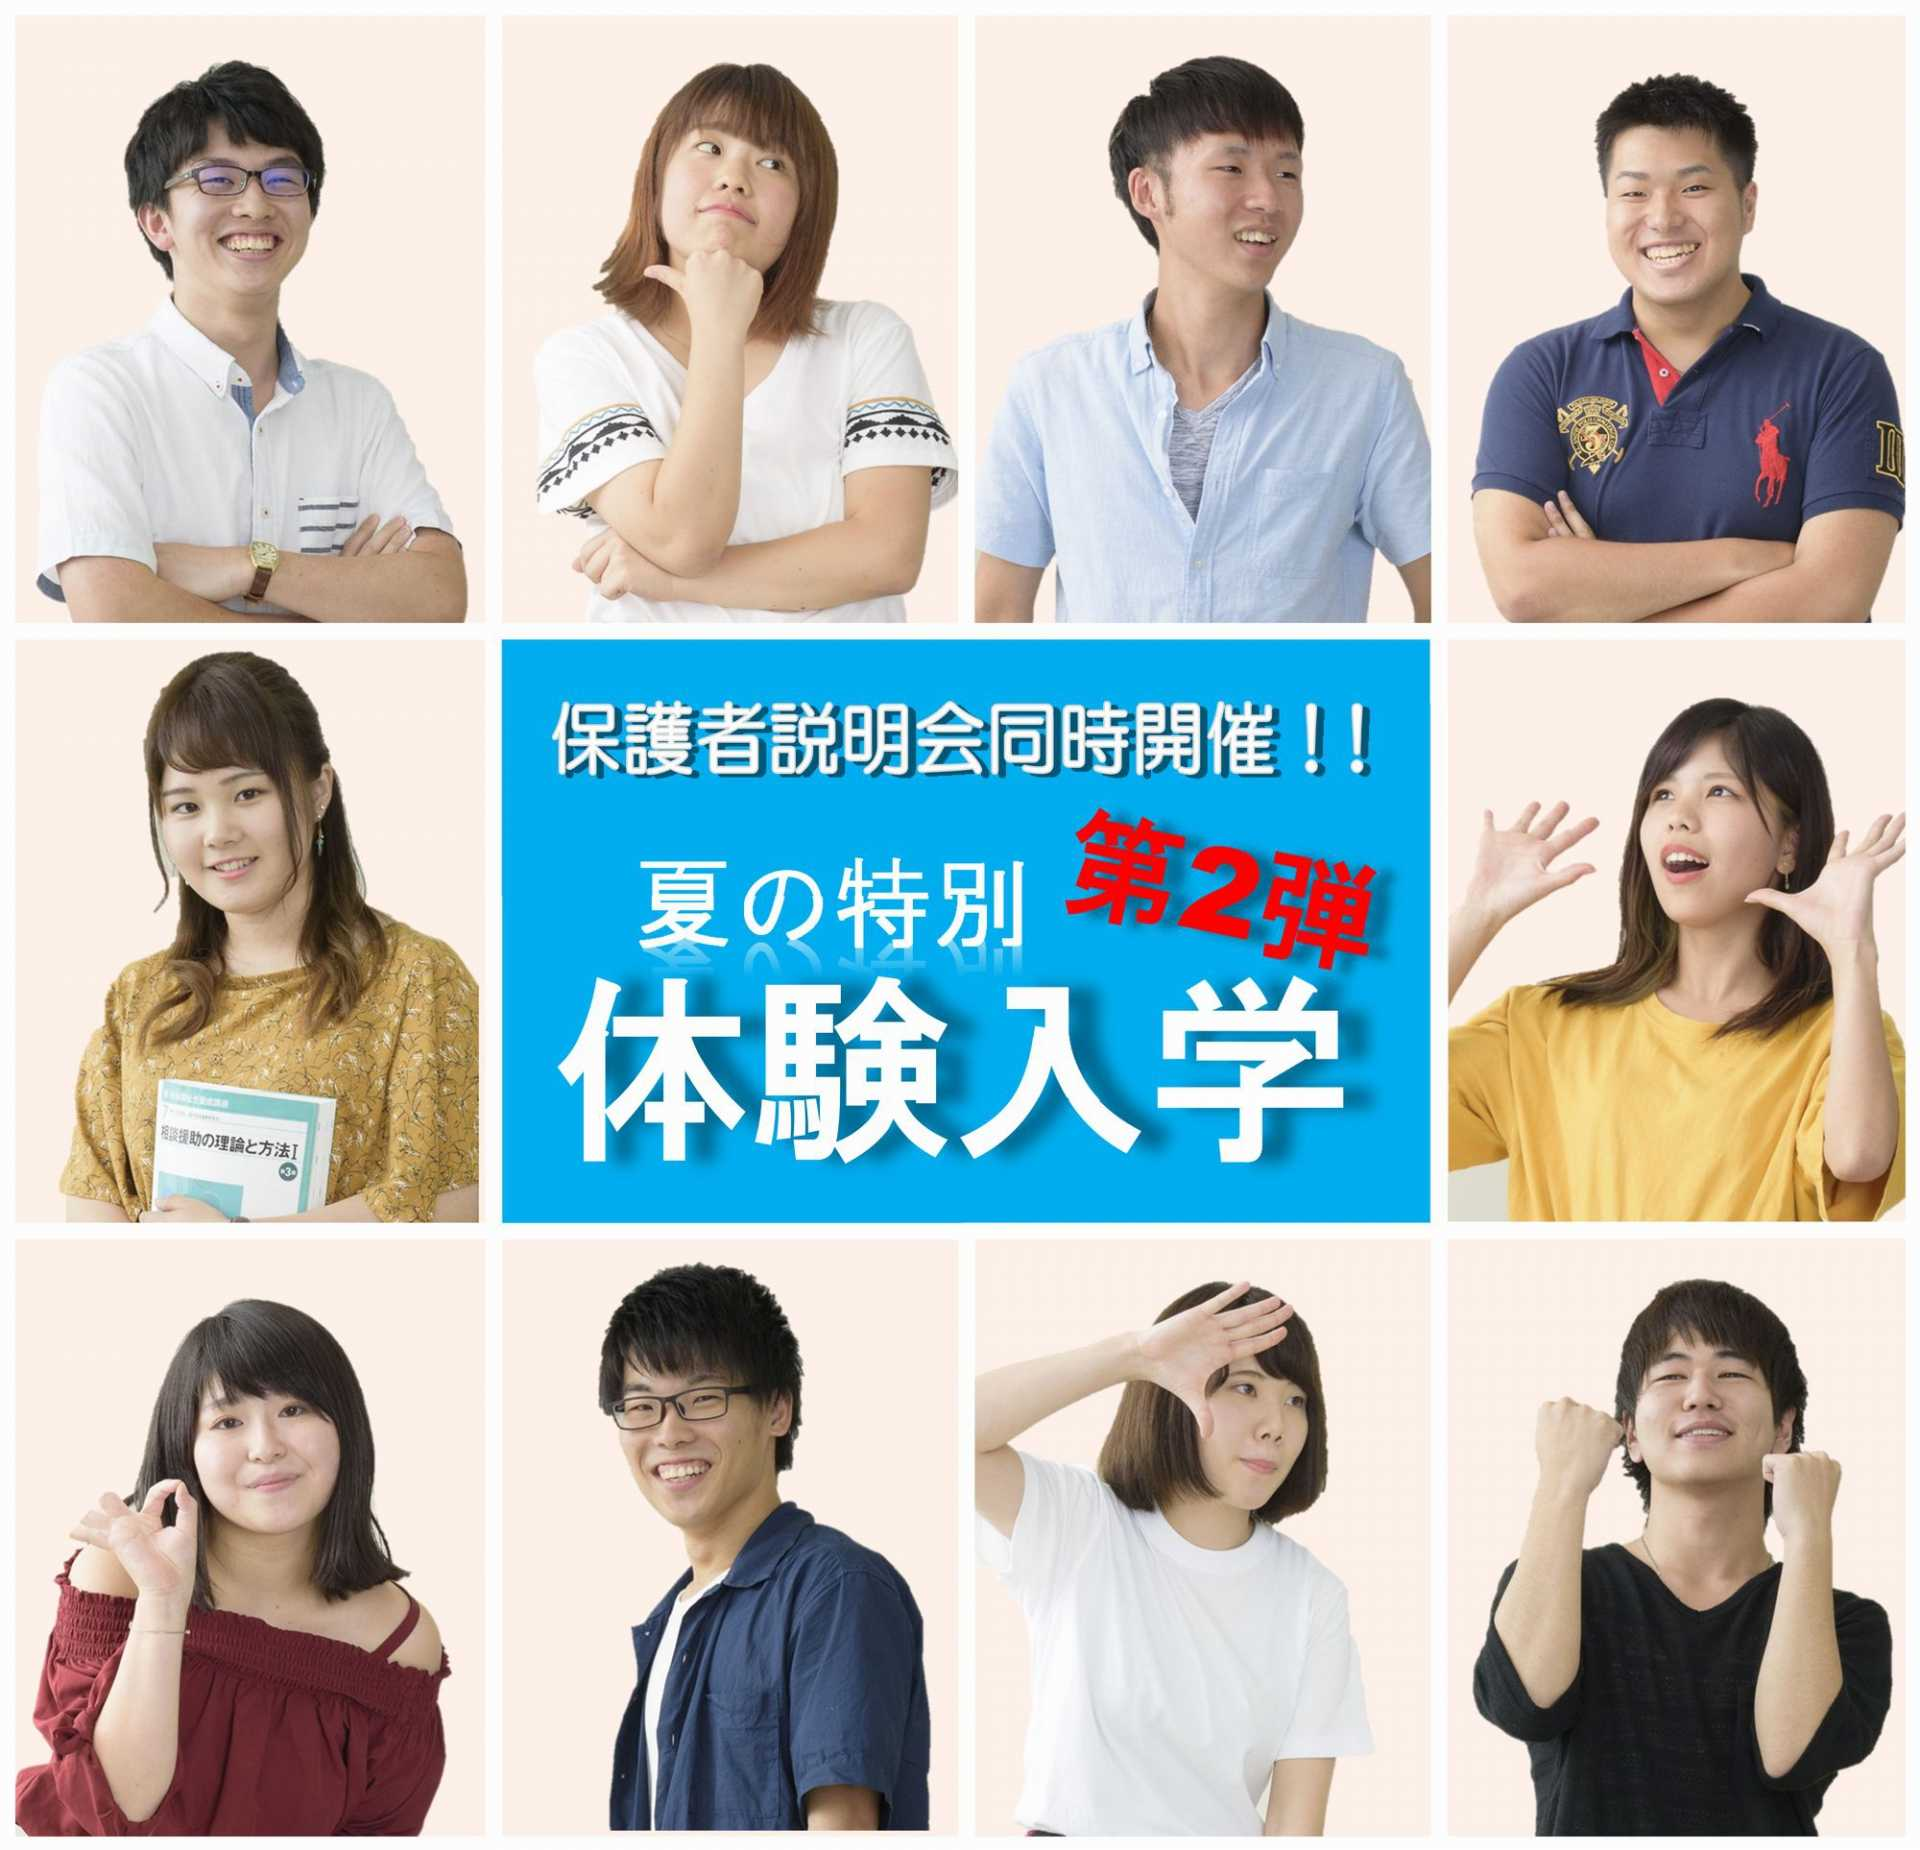 夏の特別体験入学 第2弾!!